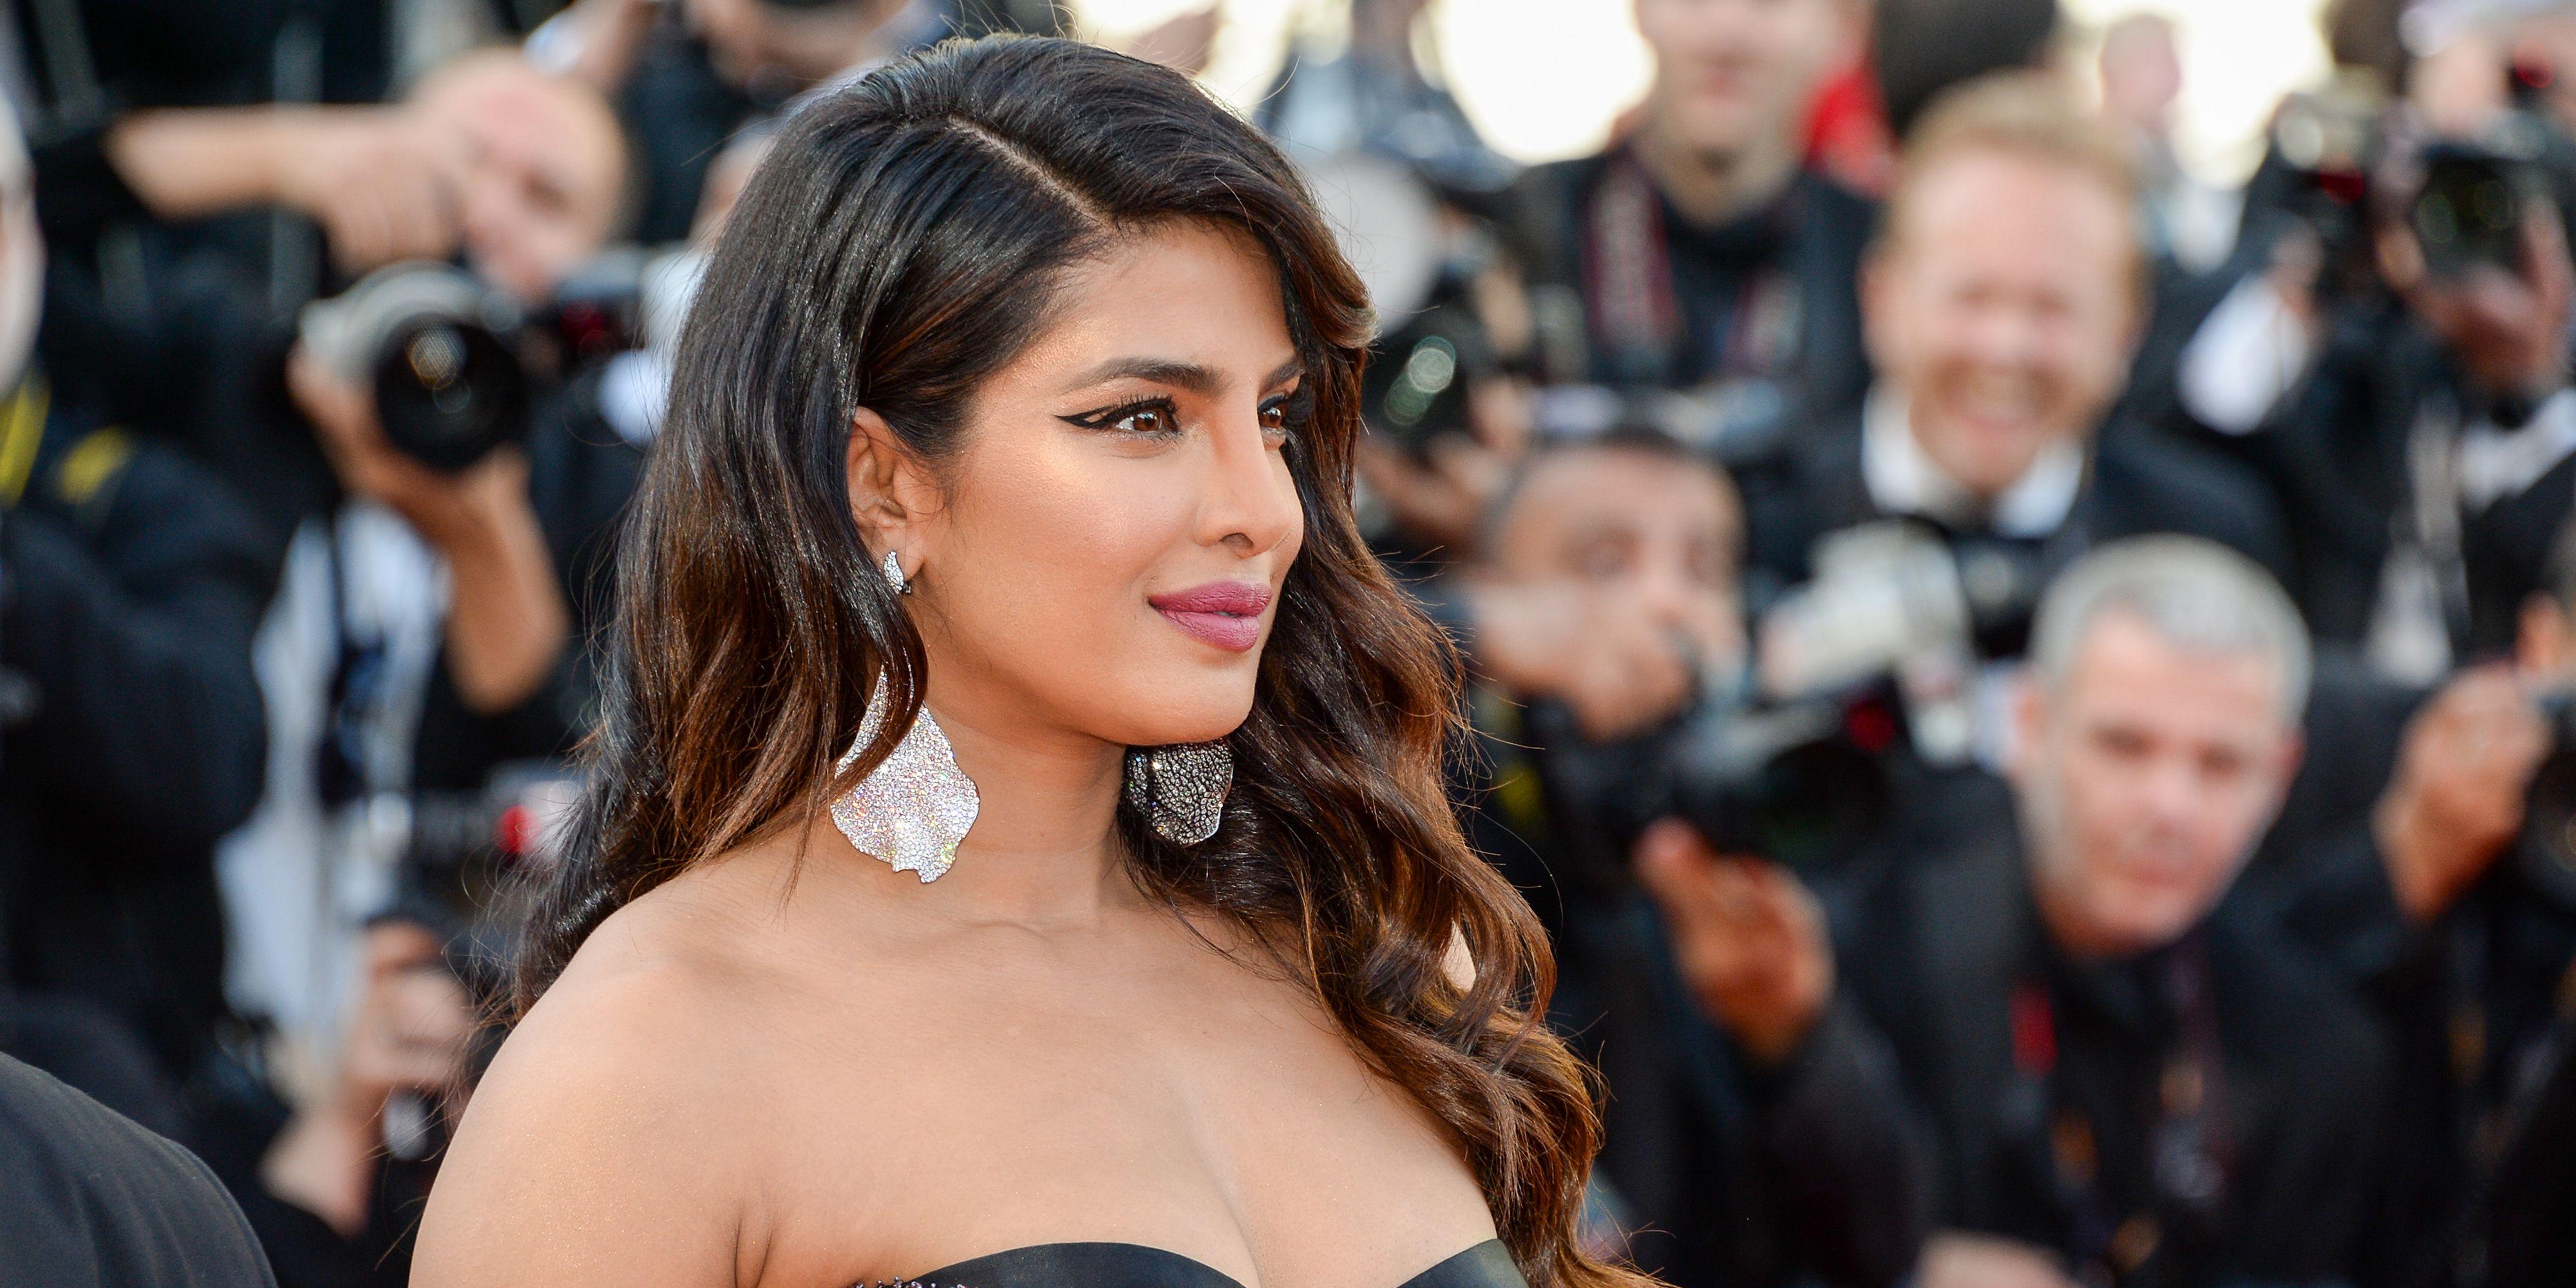 Every Single Make Up Product Priyanka Chopra Wore On The Cannes